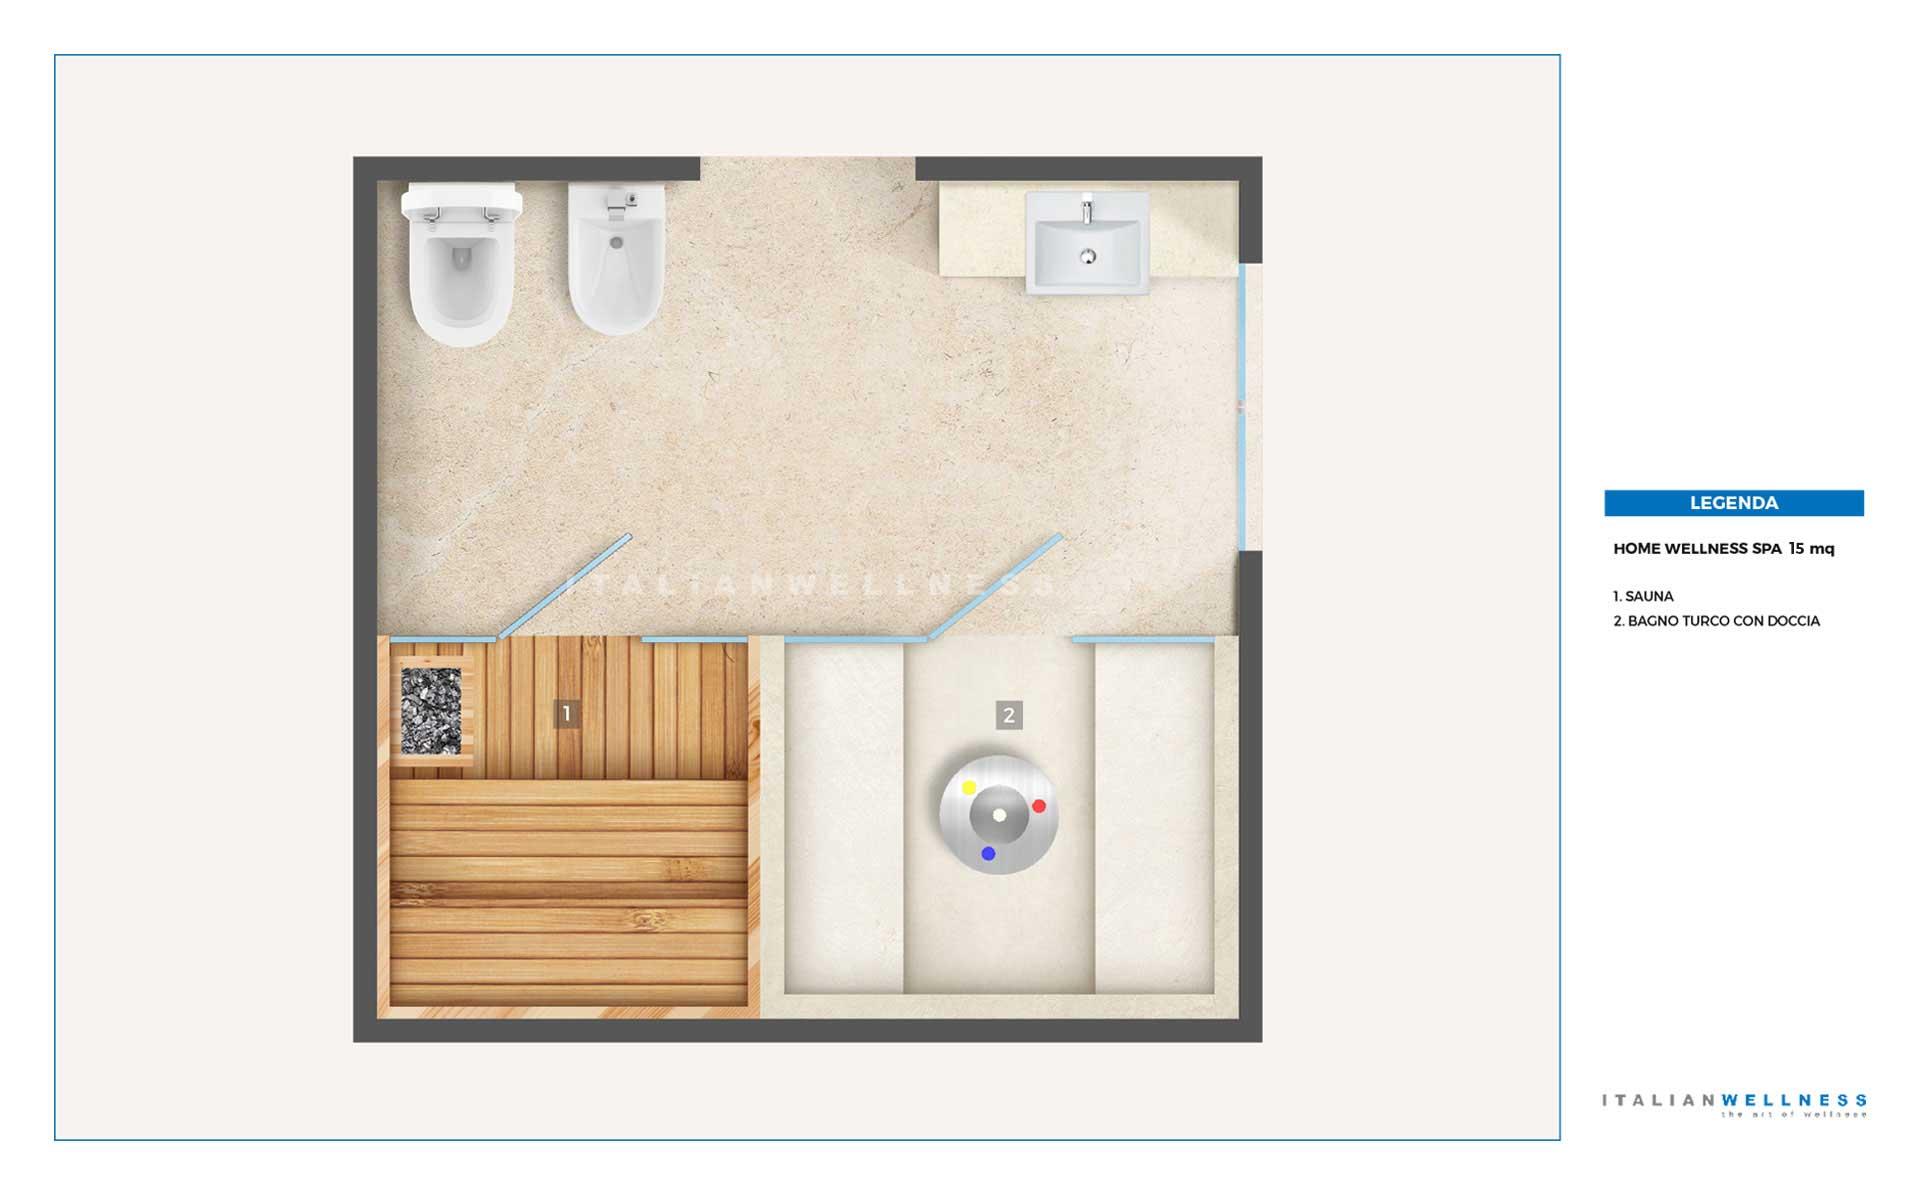 Realizzazione home wellness spa in casa for Piani di sauna a casa